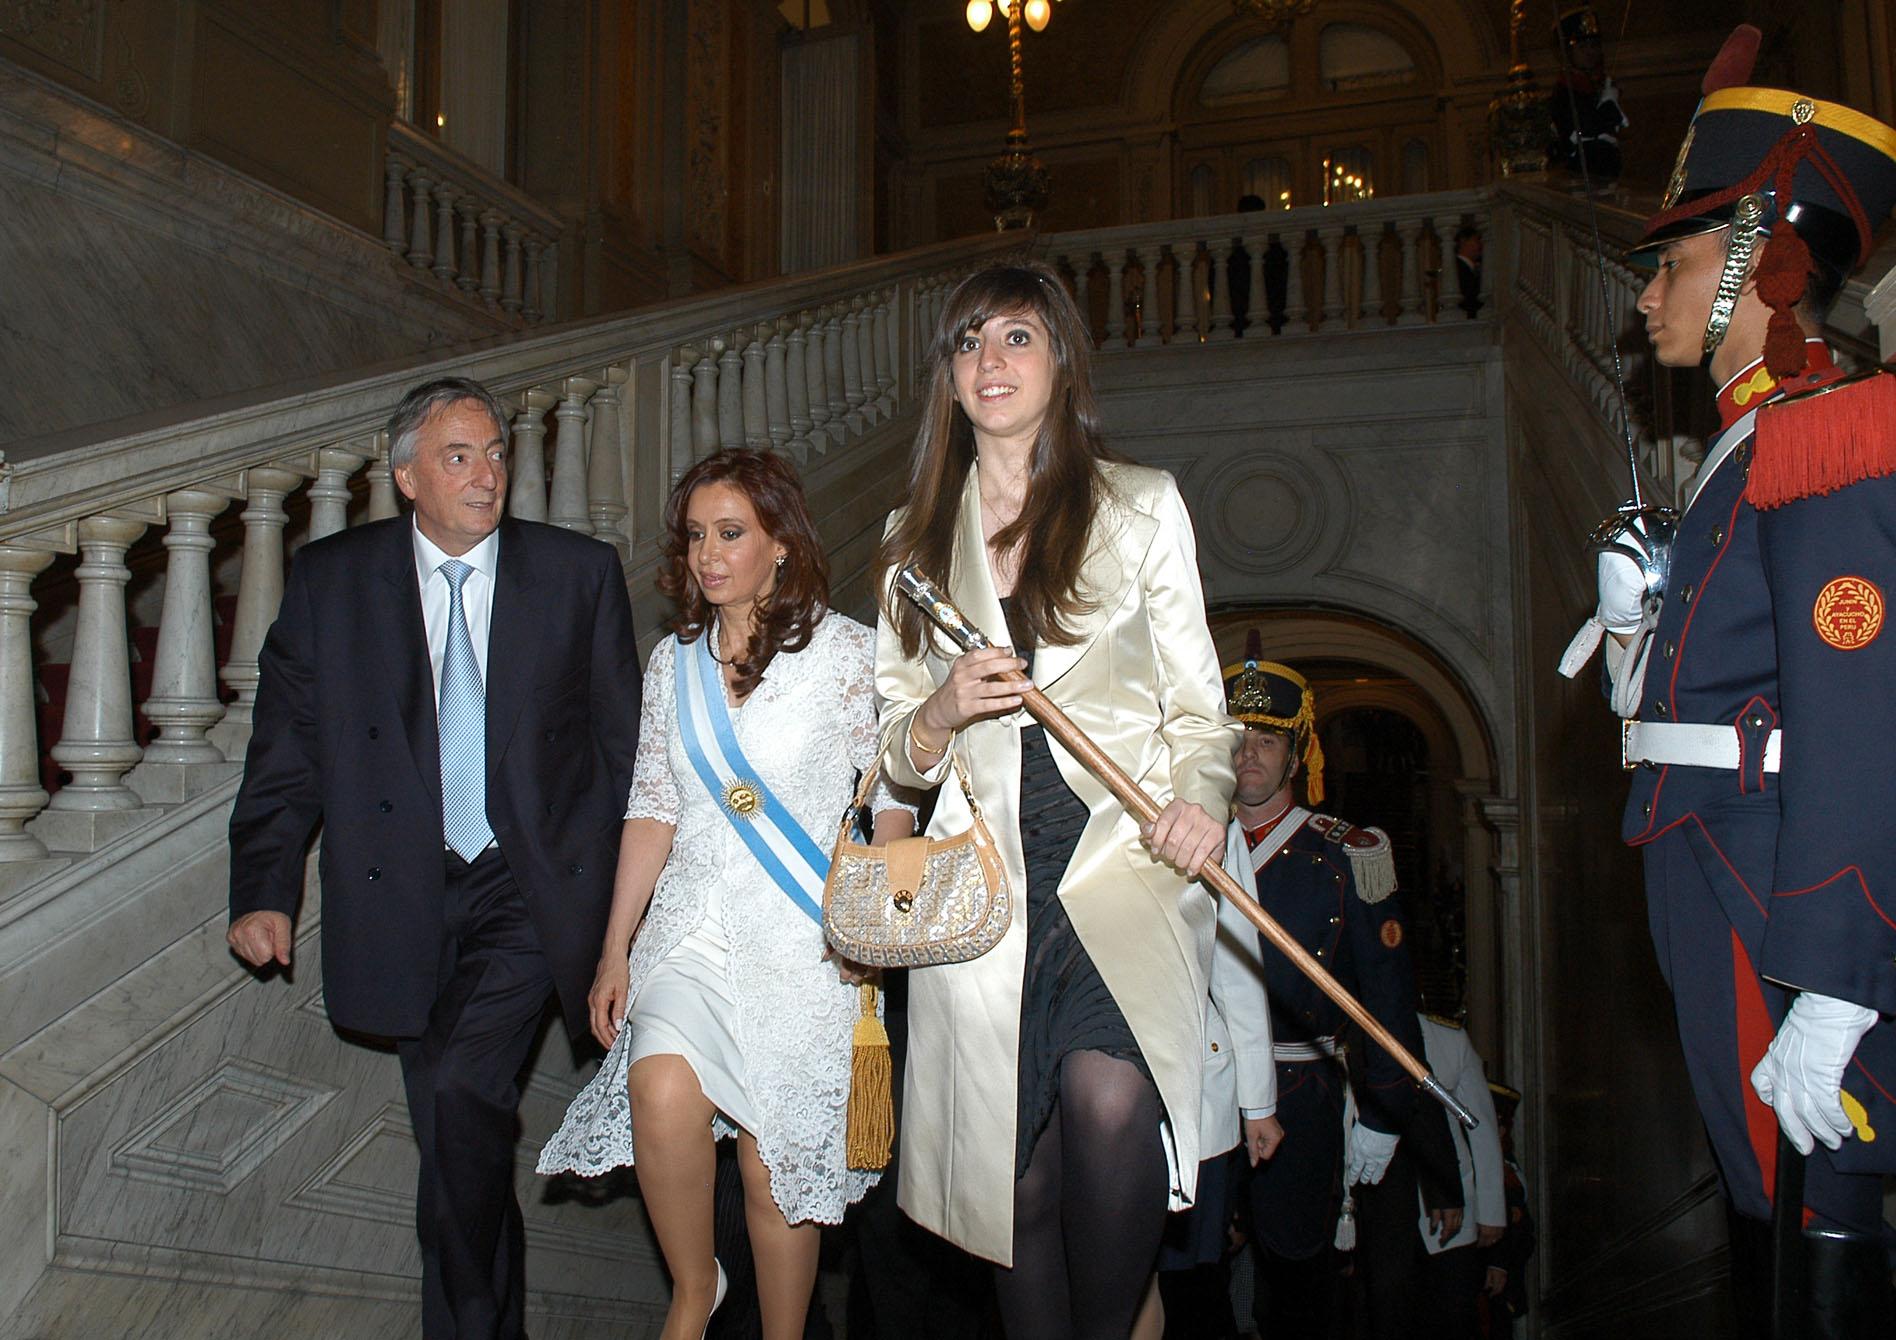 Archivo:Néstor Kirchner Cristina Fernández De Kirchner Y